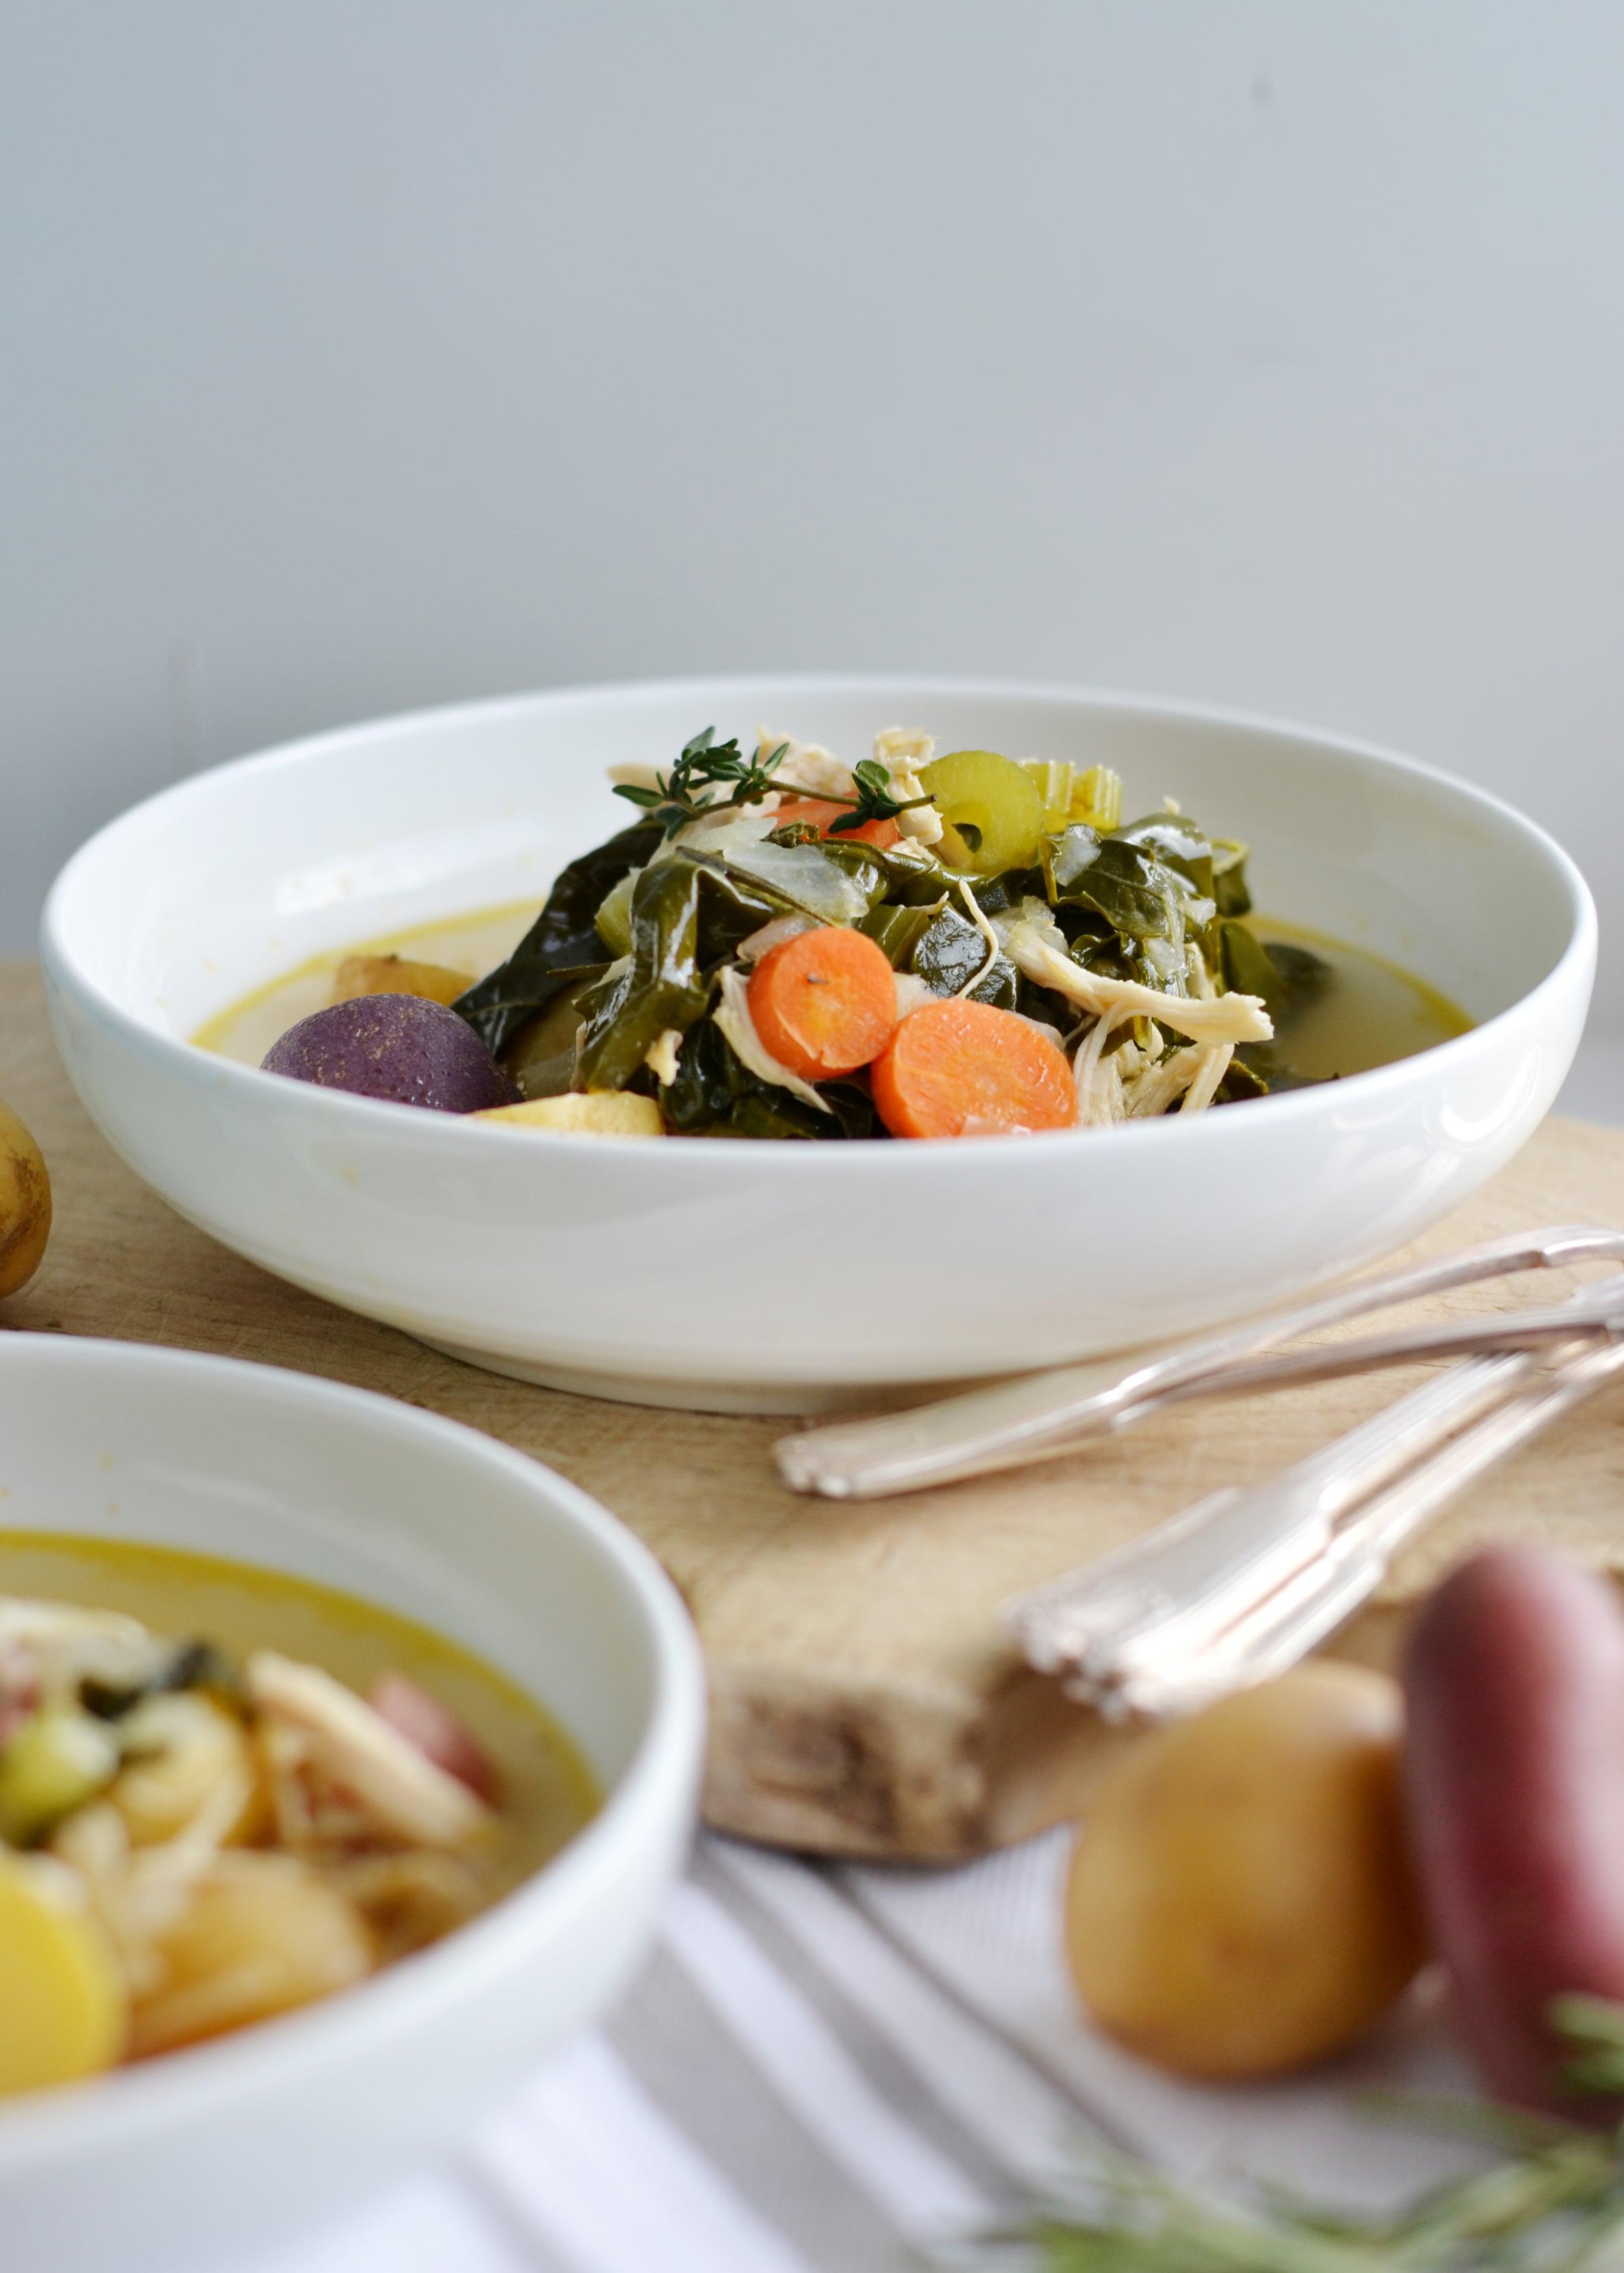 Amazing low calorie Paleo soup from boxwoodavenue.com